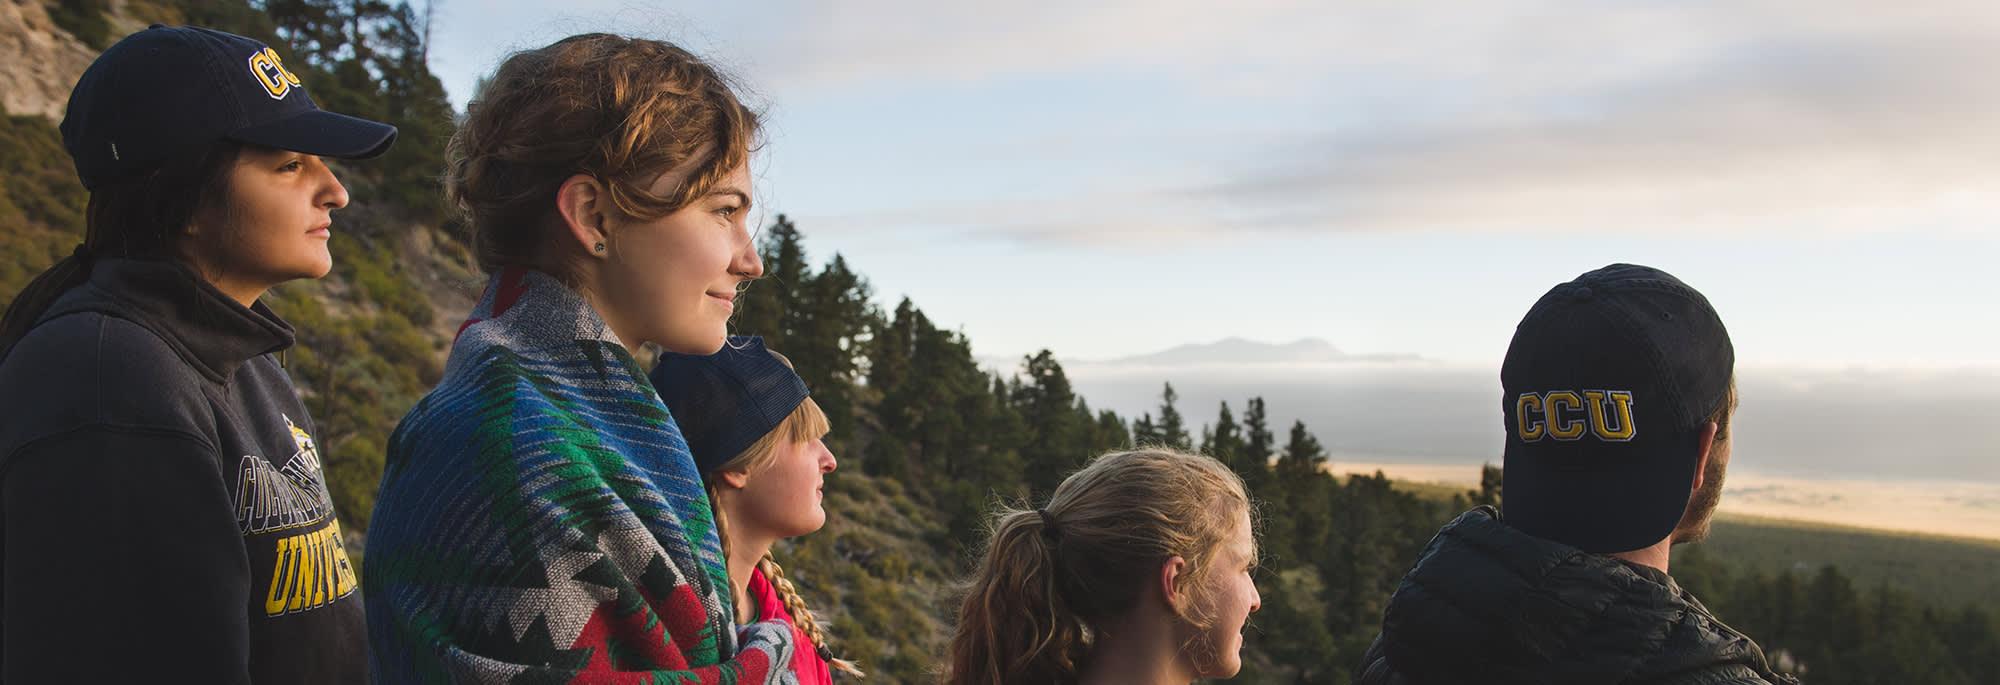 CCU students looking at Colorado sunrise